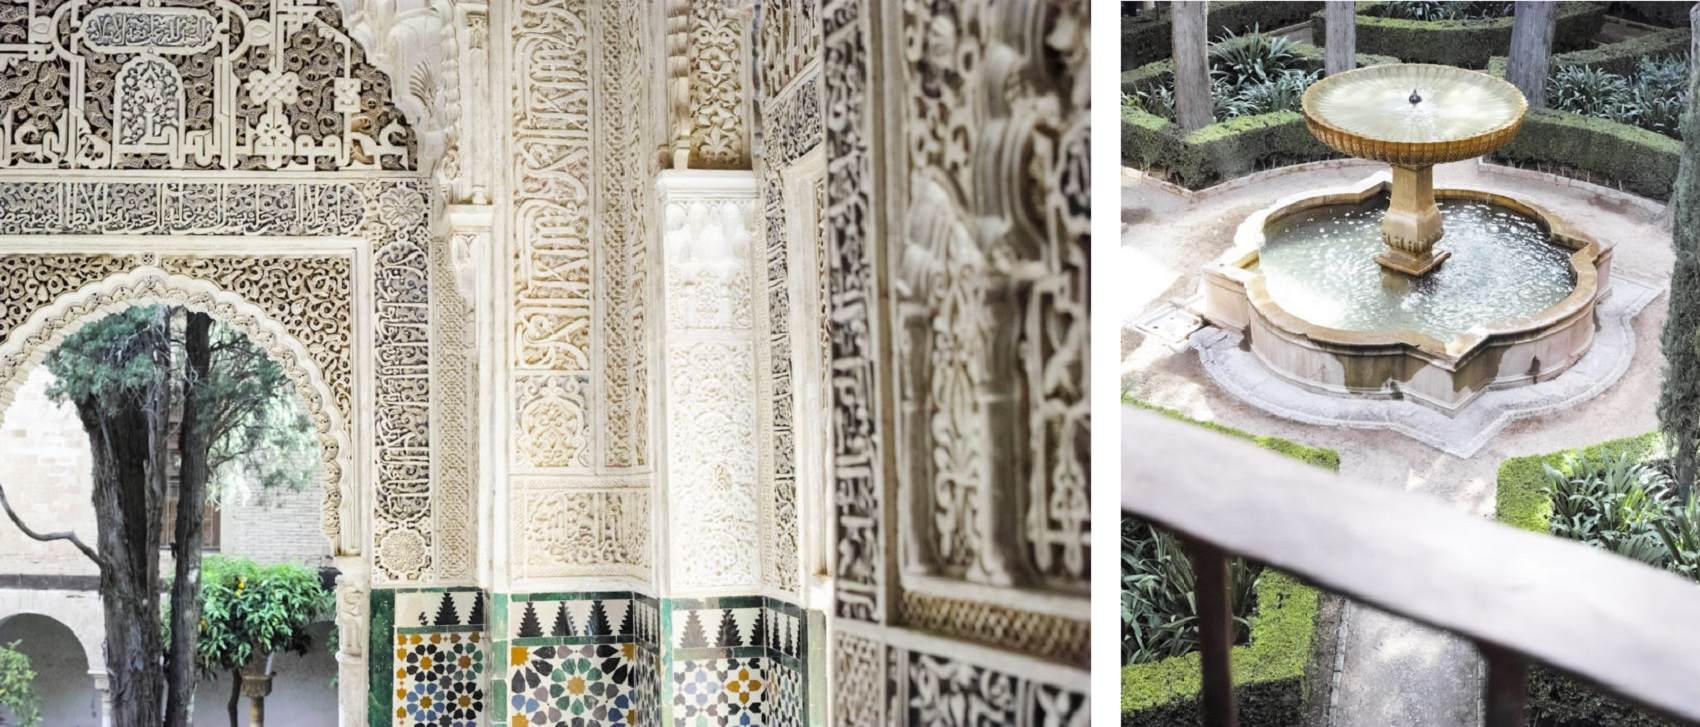 alhambra-palace-best-castles